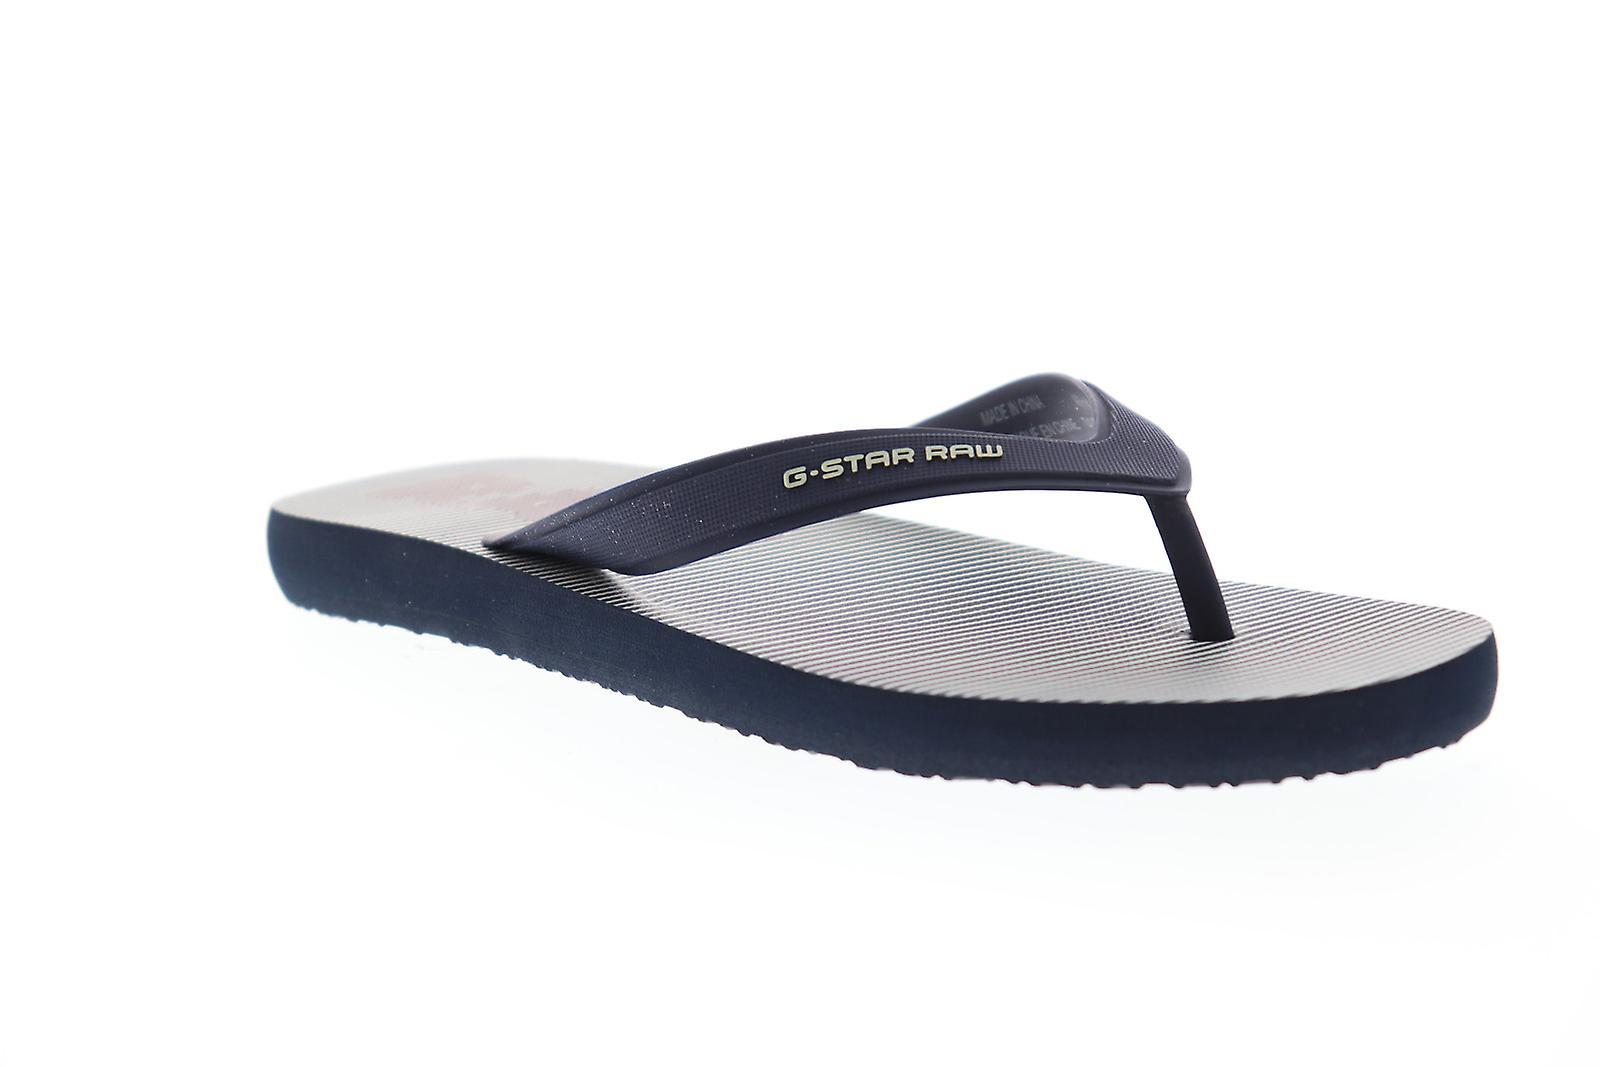 G-Star Raw dend Hickory AOP miesten sininen remmi slip on Flip-Flops Sandaalit kengät